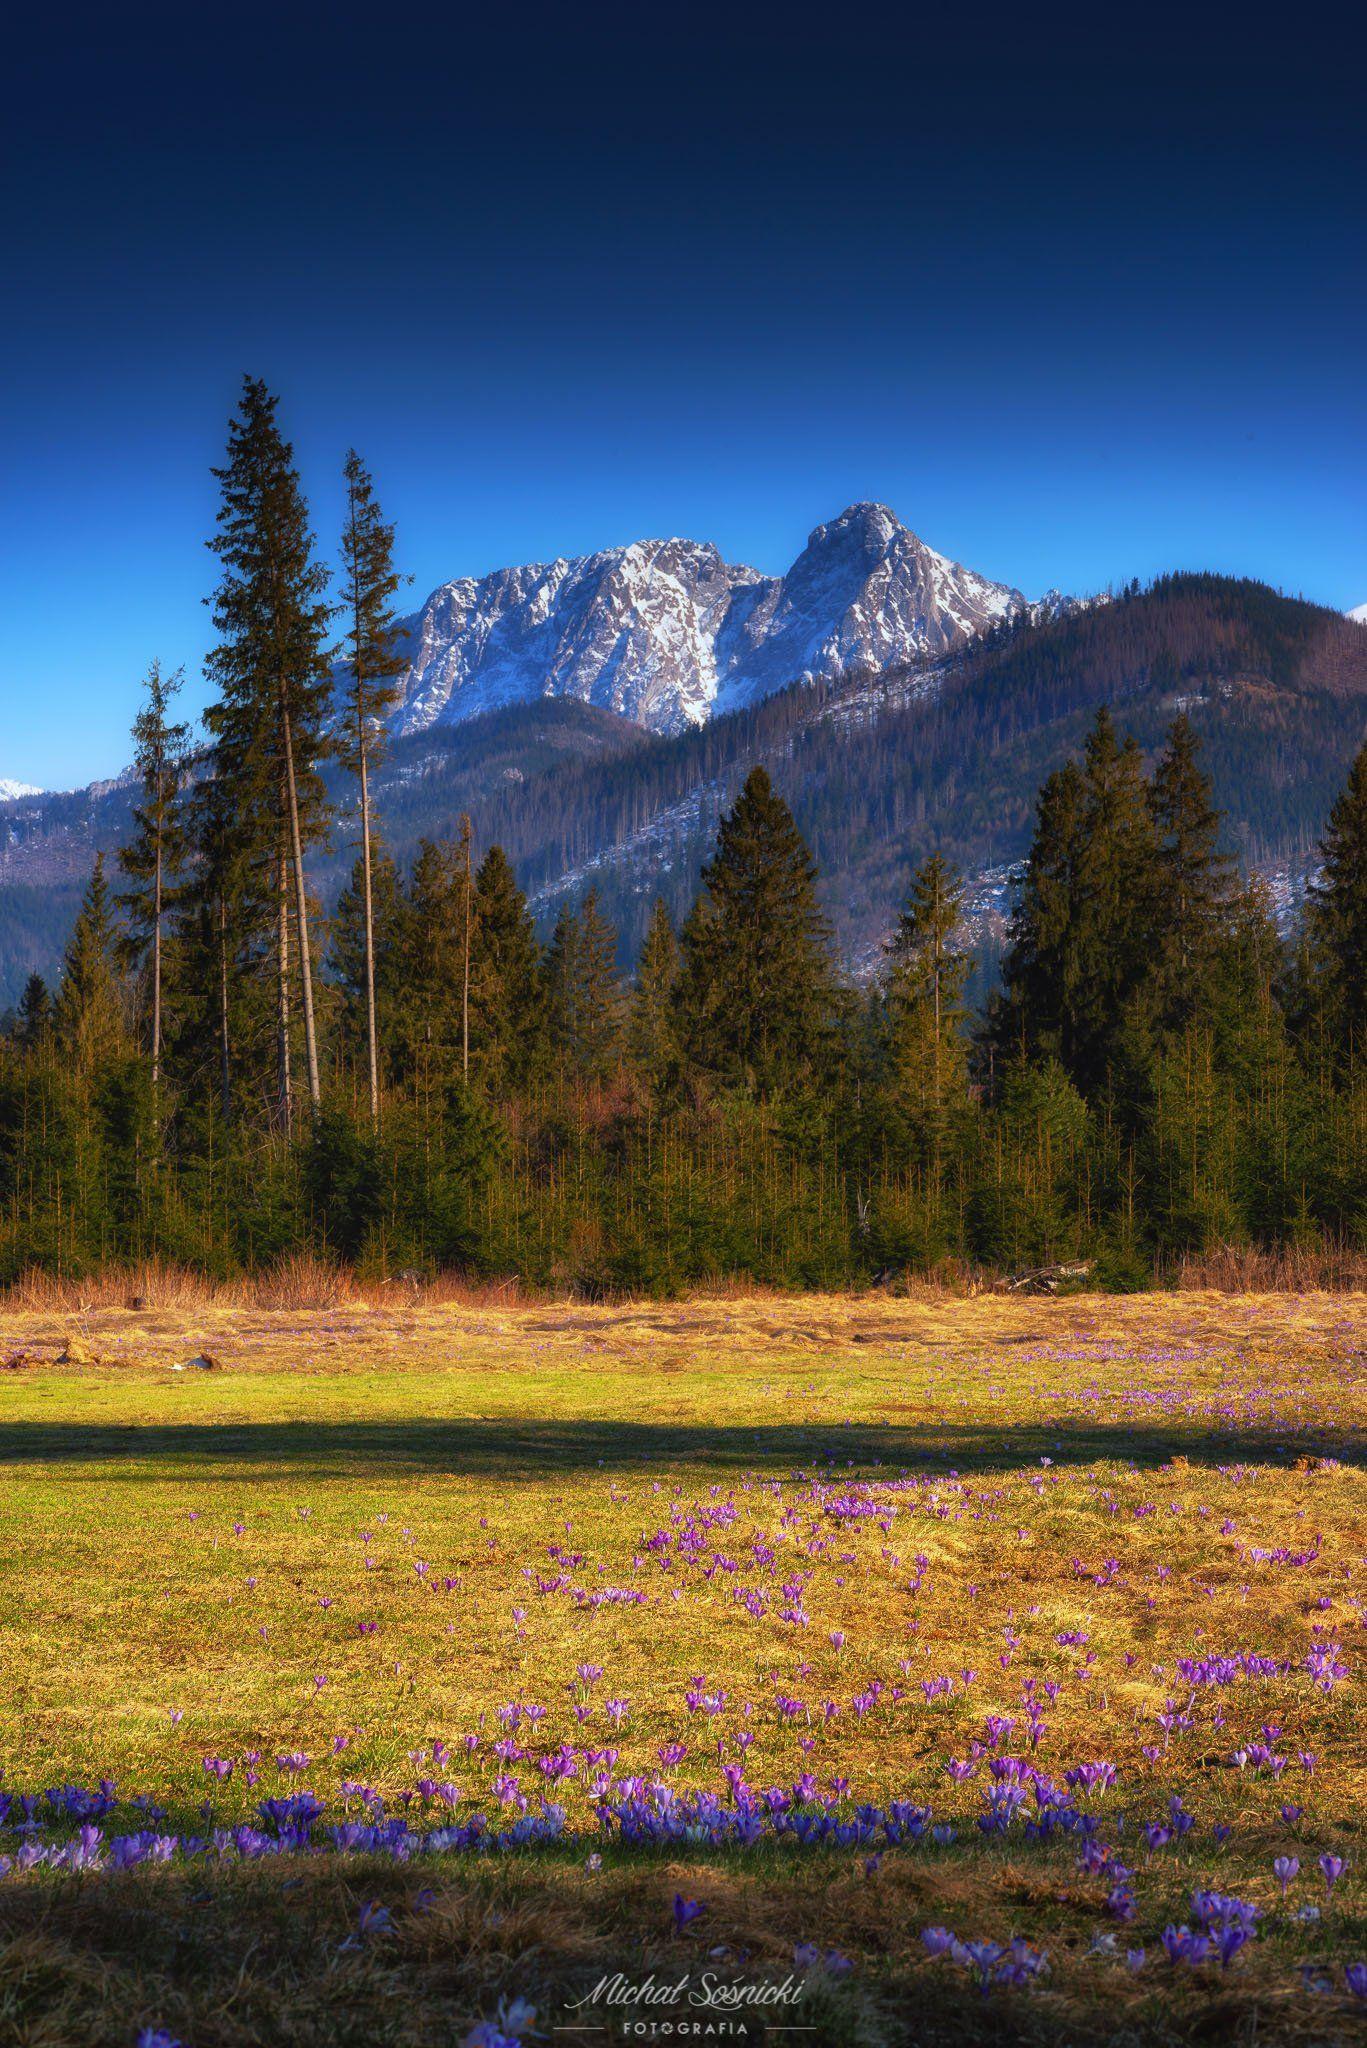 #mountain #tatras #landscape #color #pentax #benro #giewont #poland #crocus, Sośnicki Michał